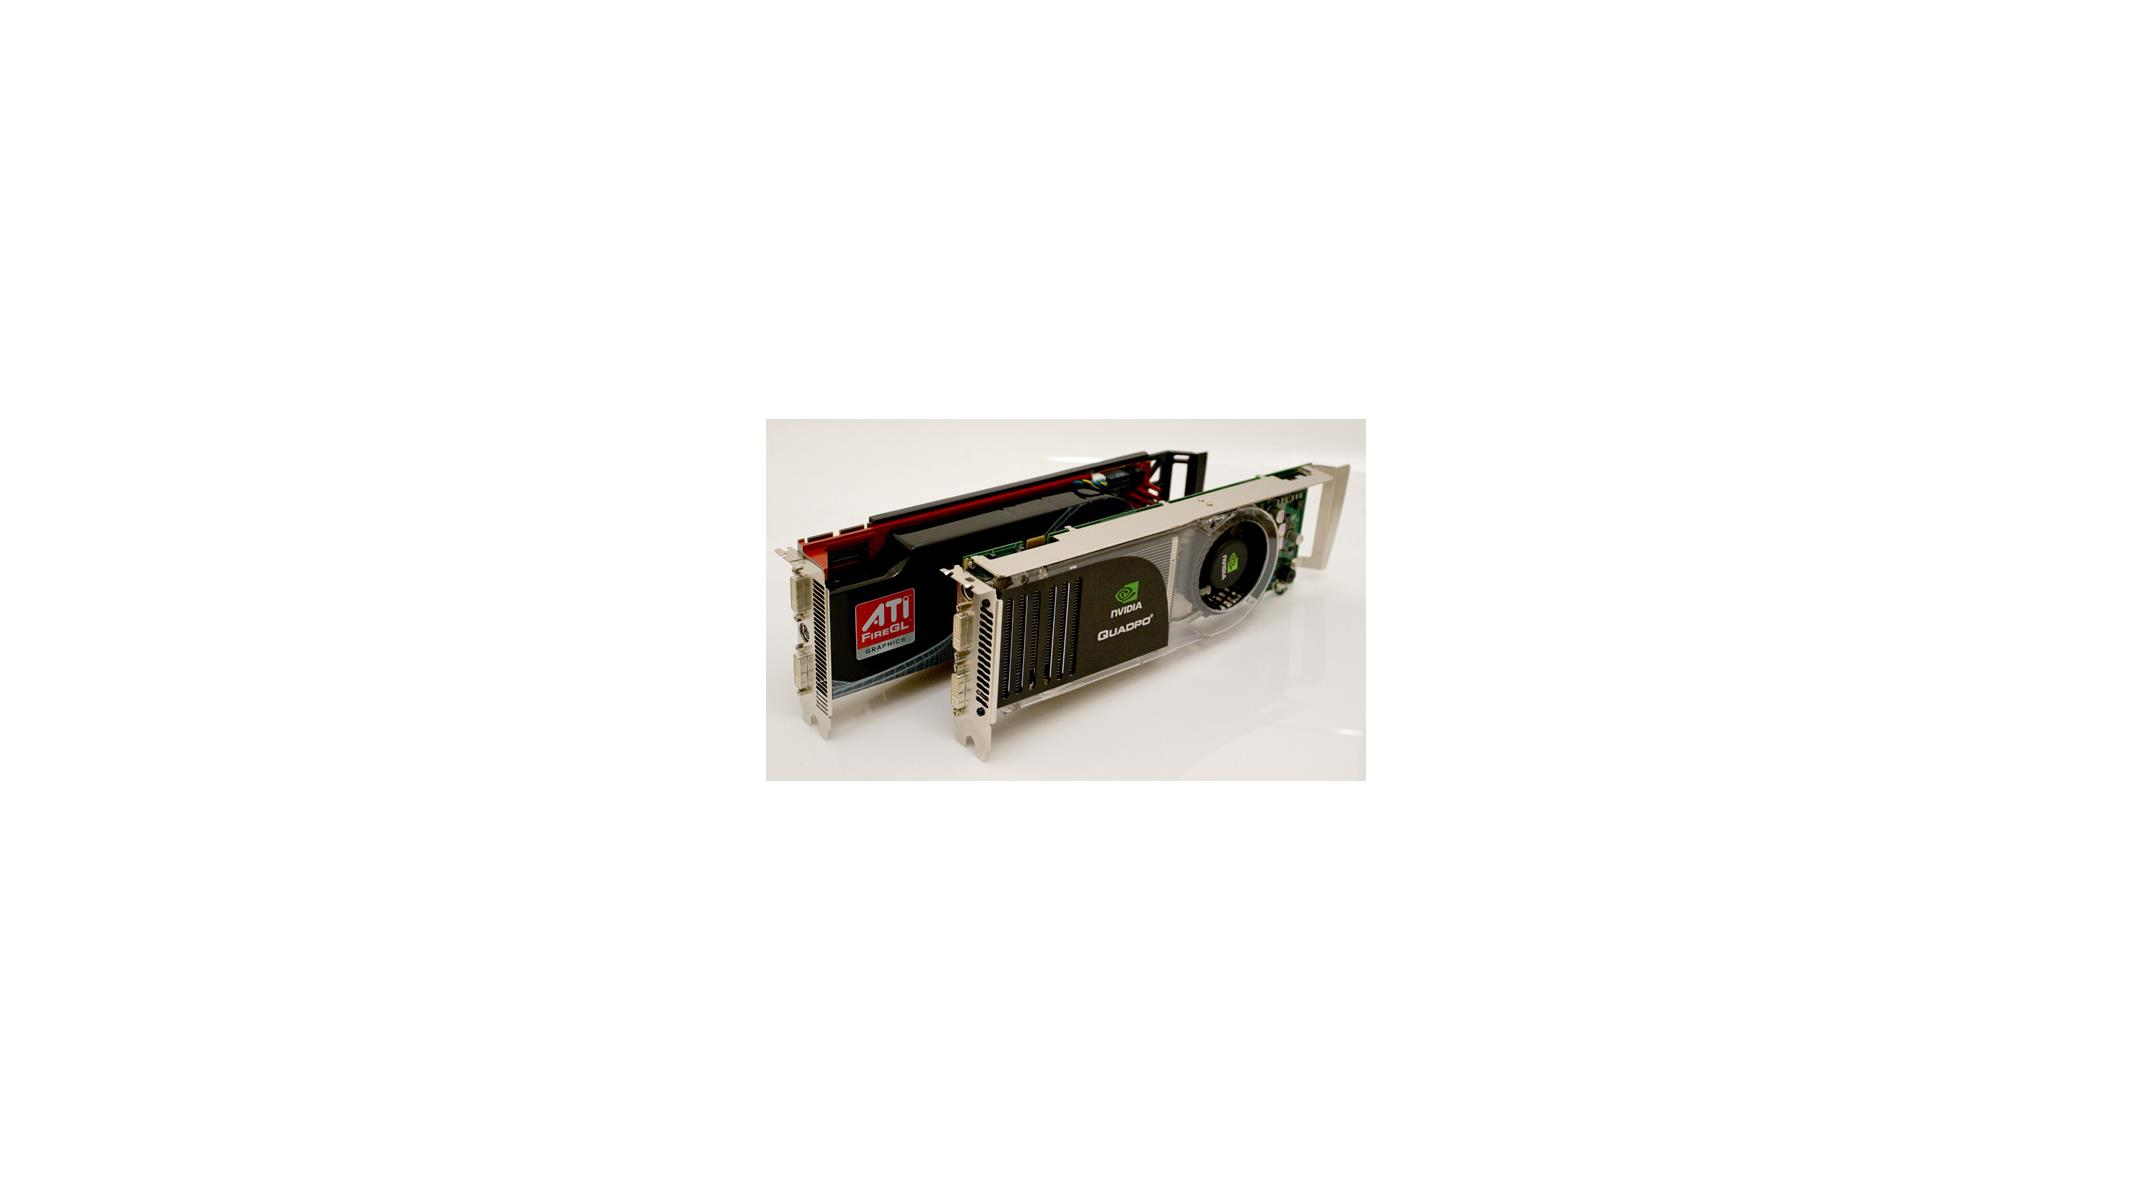 ATI RADEON FIRE GL 8800 (MICROSOFT CORPORATION) DRIVERS FOR WINDOWS 10